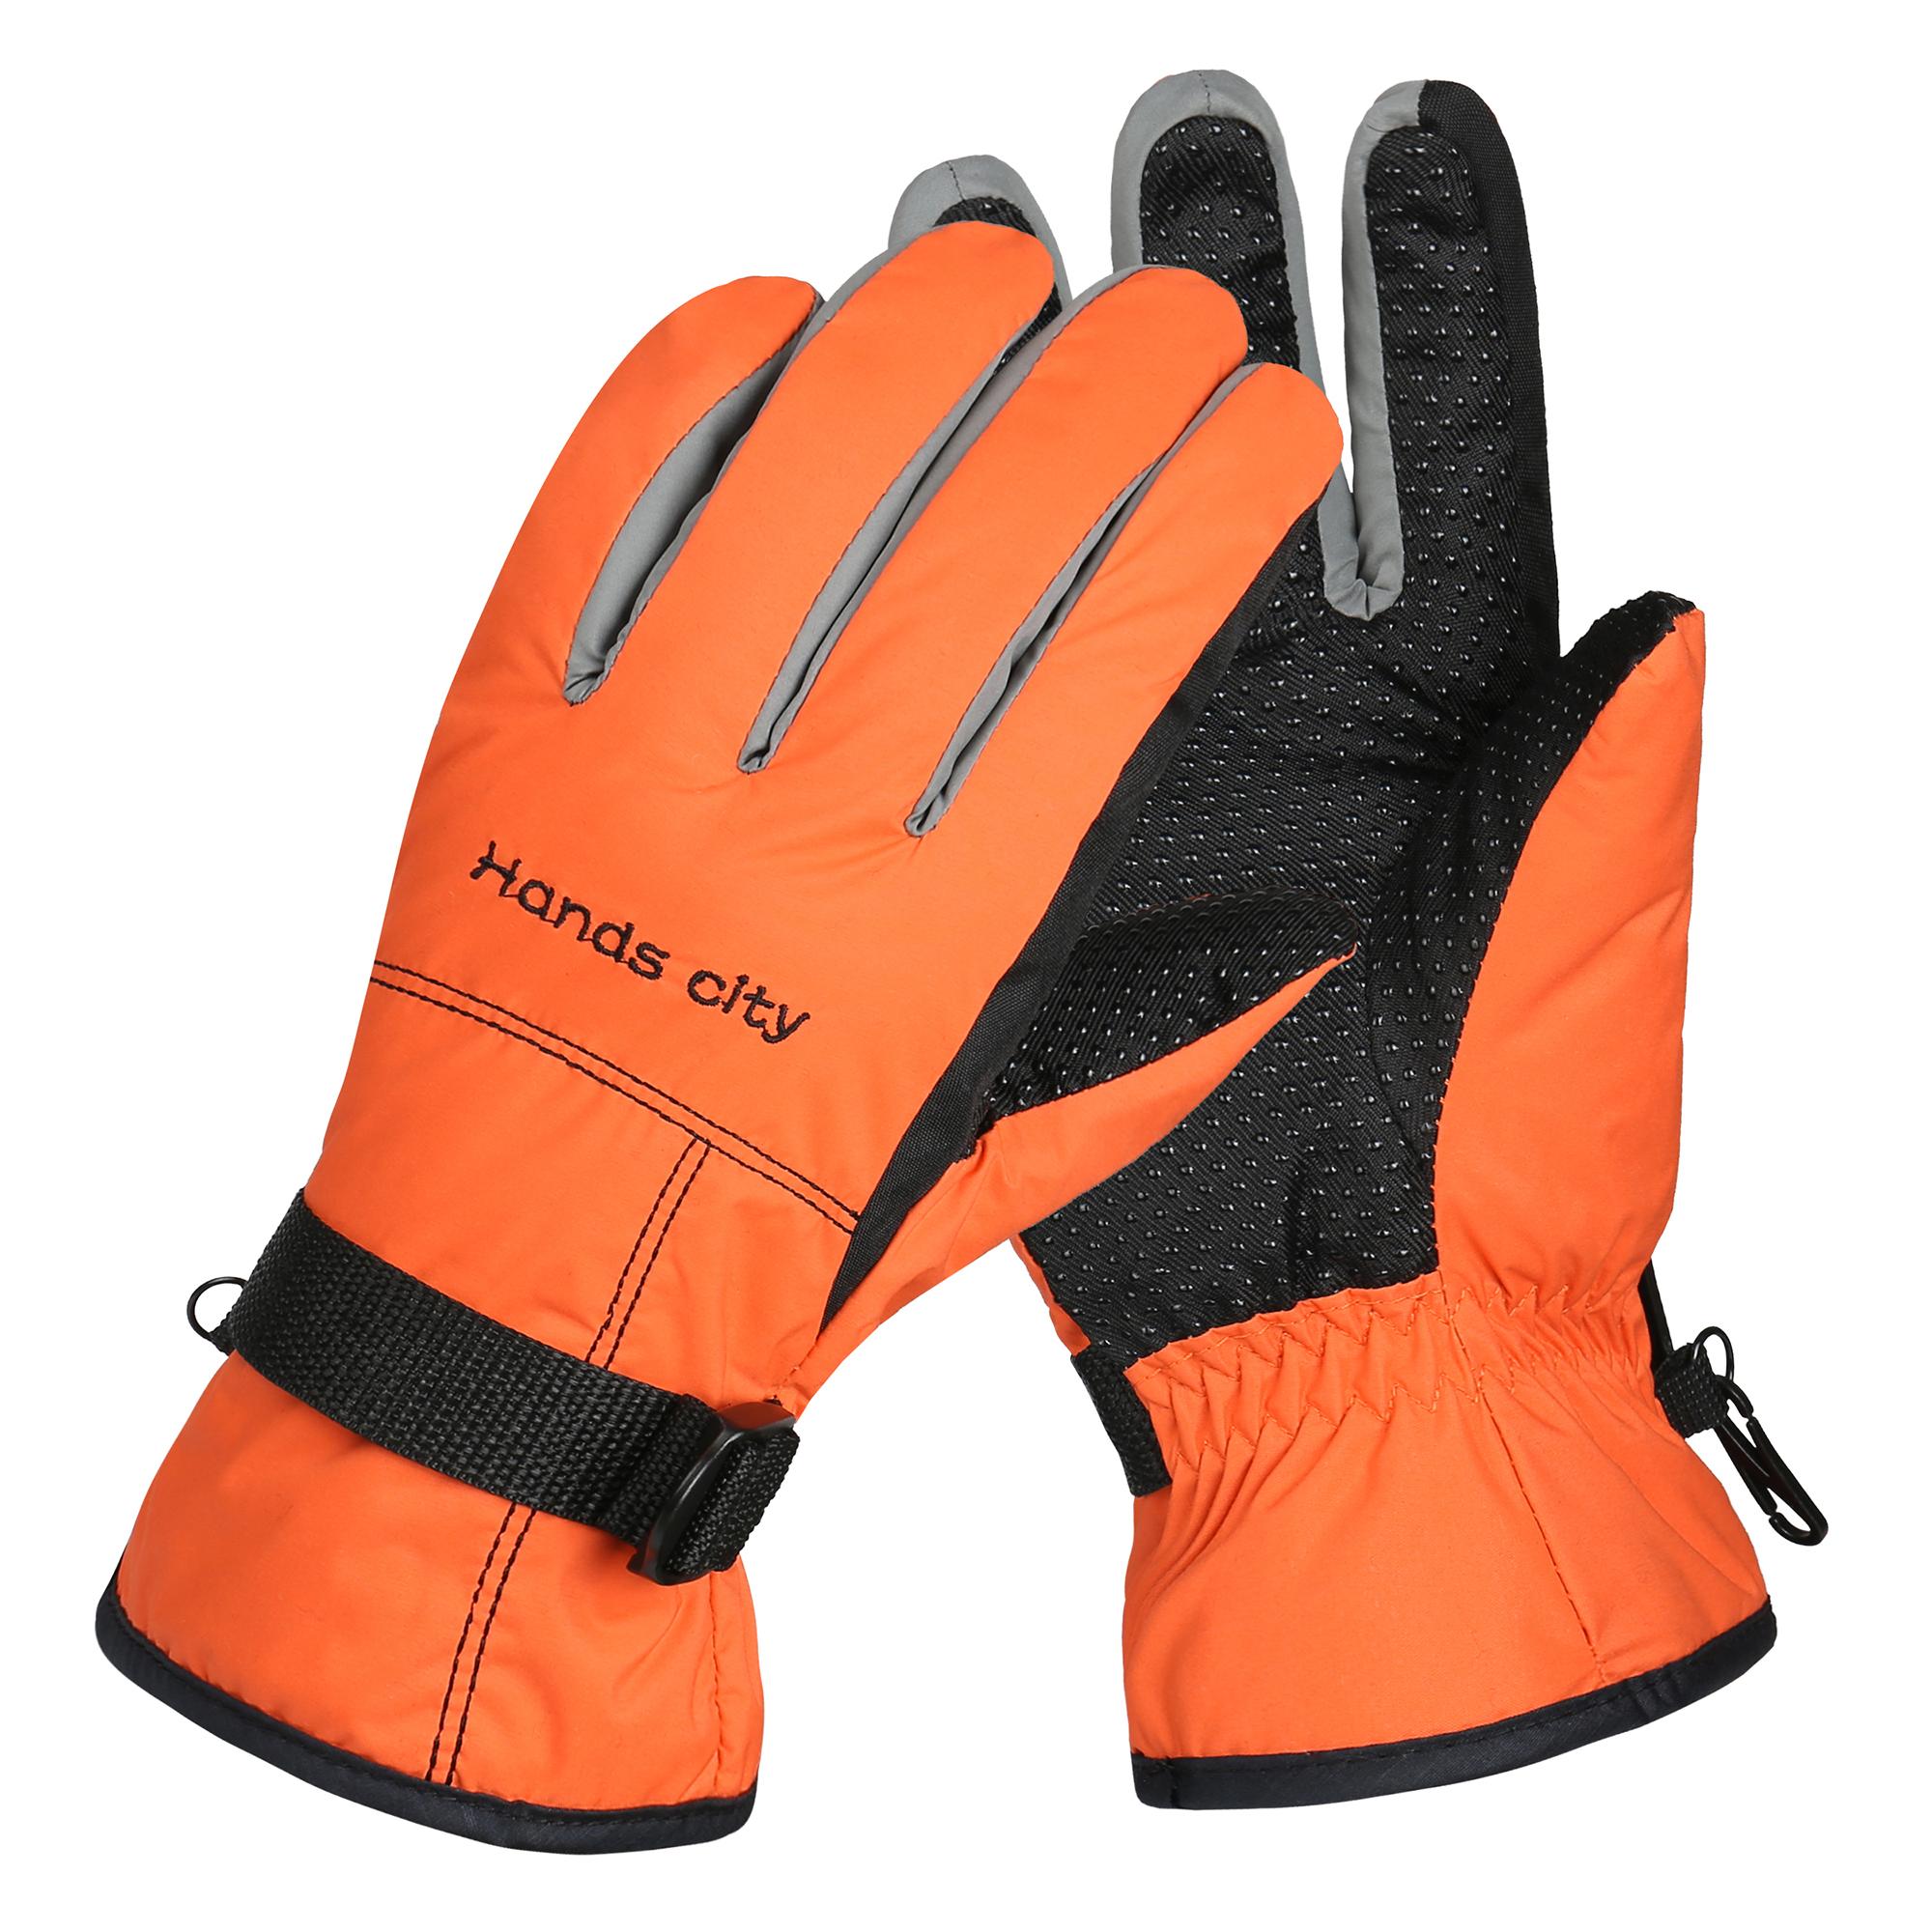 Sport Snow Gloves: Winter Glove Thermal Waterproof Ski Warm Snowboard Sports